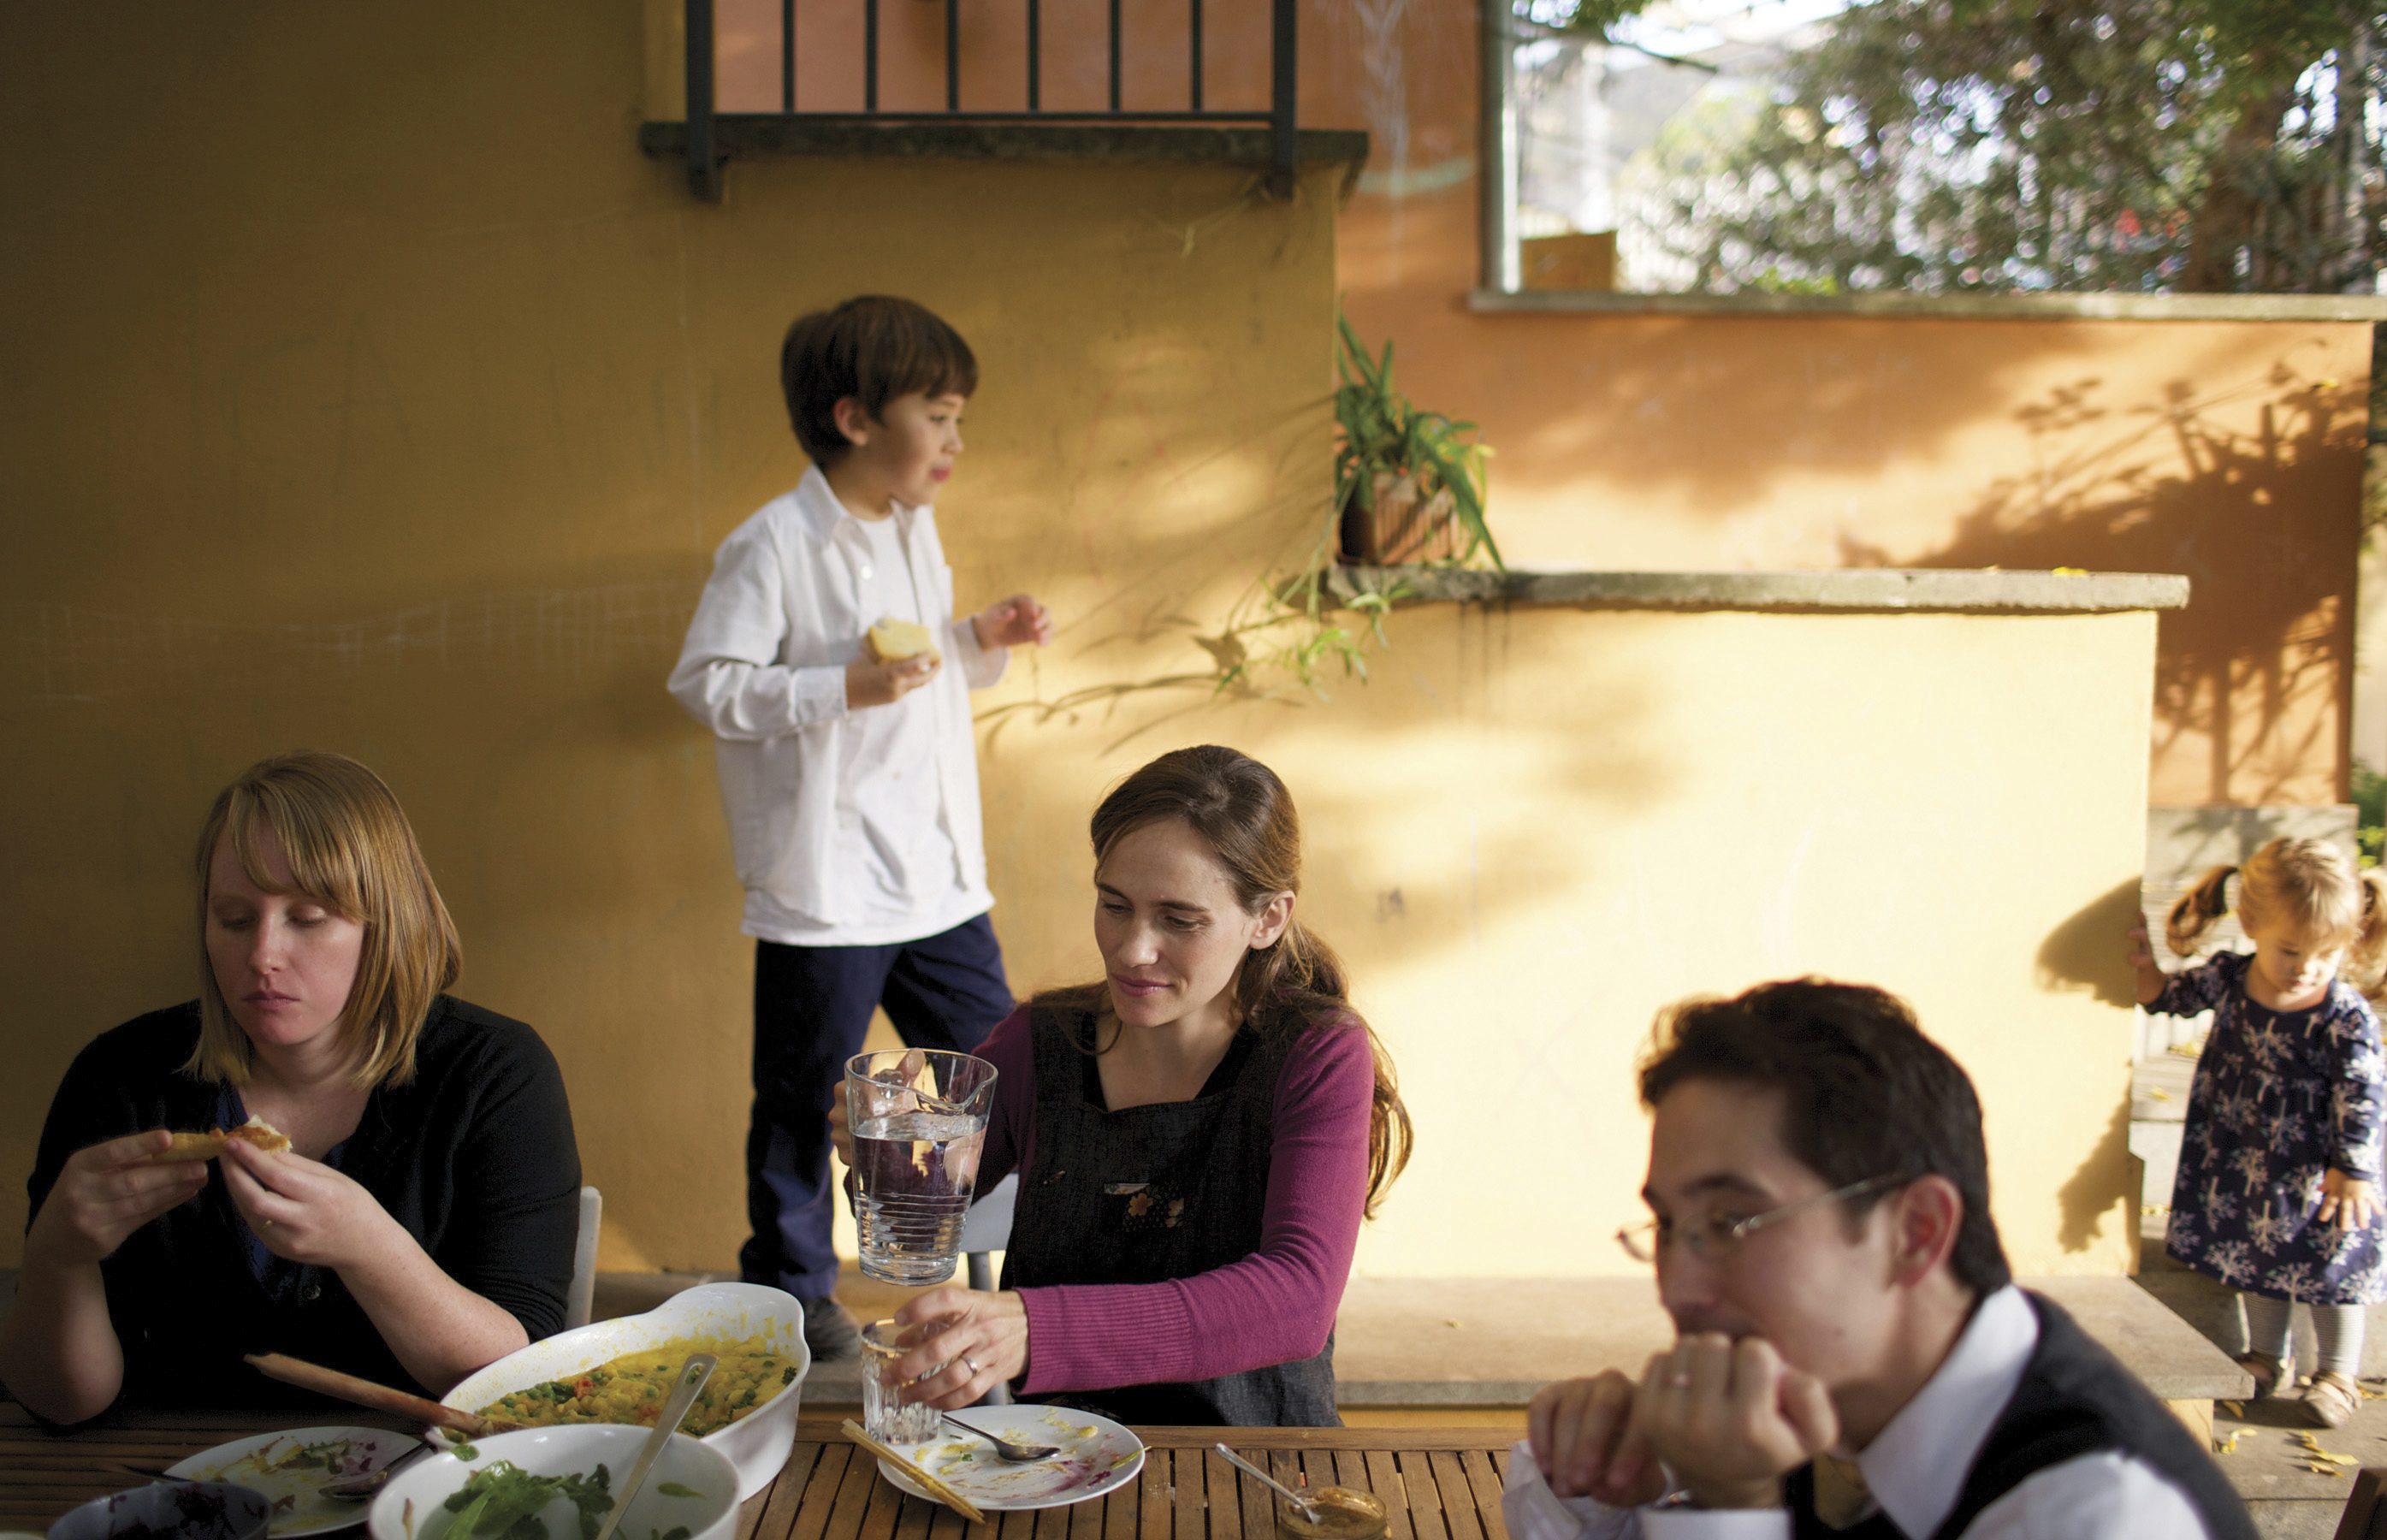 The Covingtons enjoy gathering together for meals.